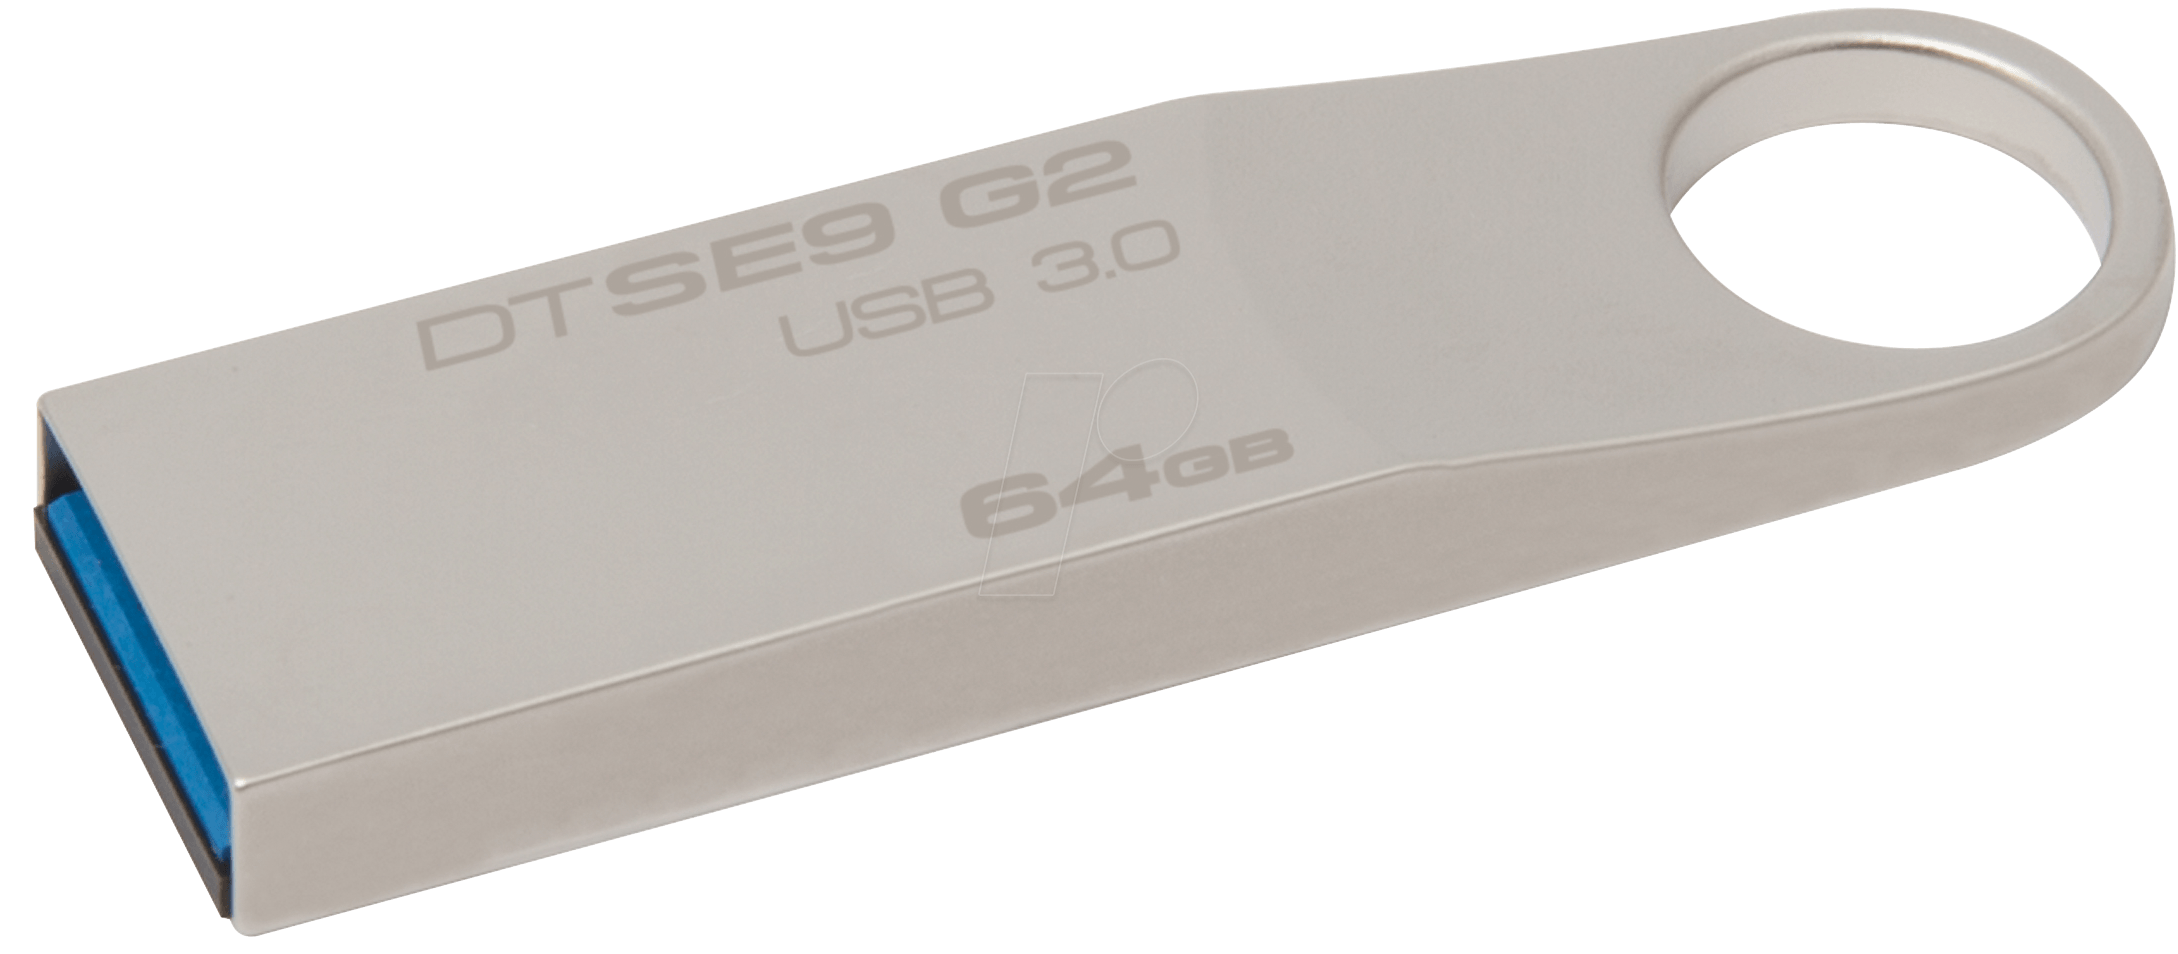 dtse9g2 64gb datatraveler se9 g2 usb 3 0 stick 64 gb. Black Bedroom Furniture Sets. Home Design Ideas